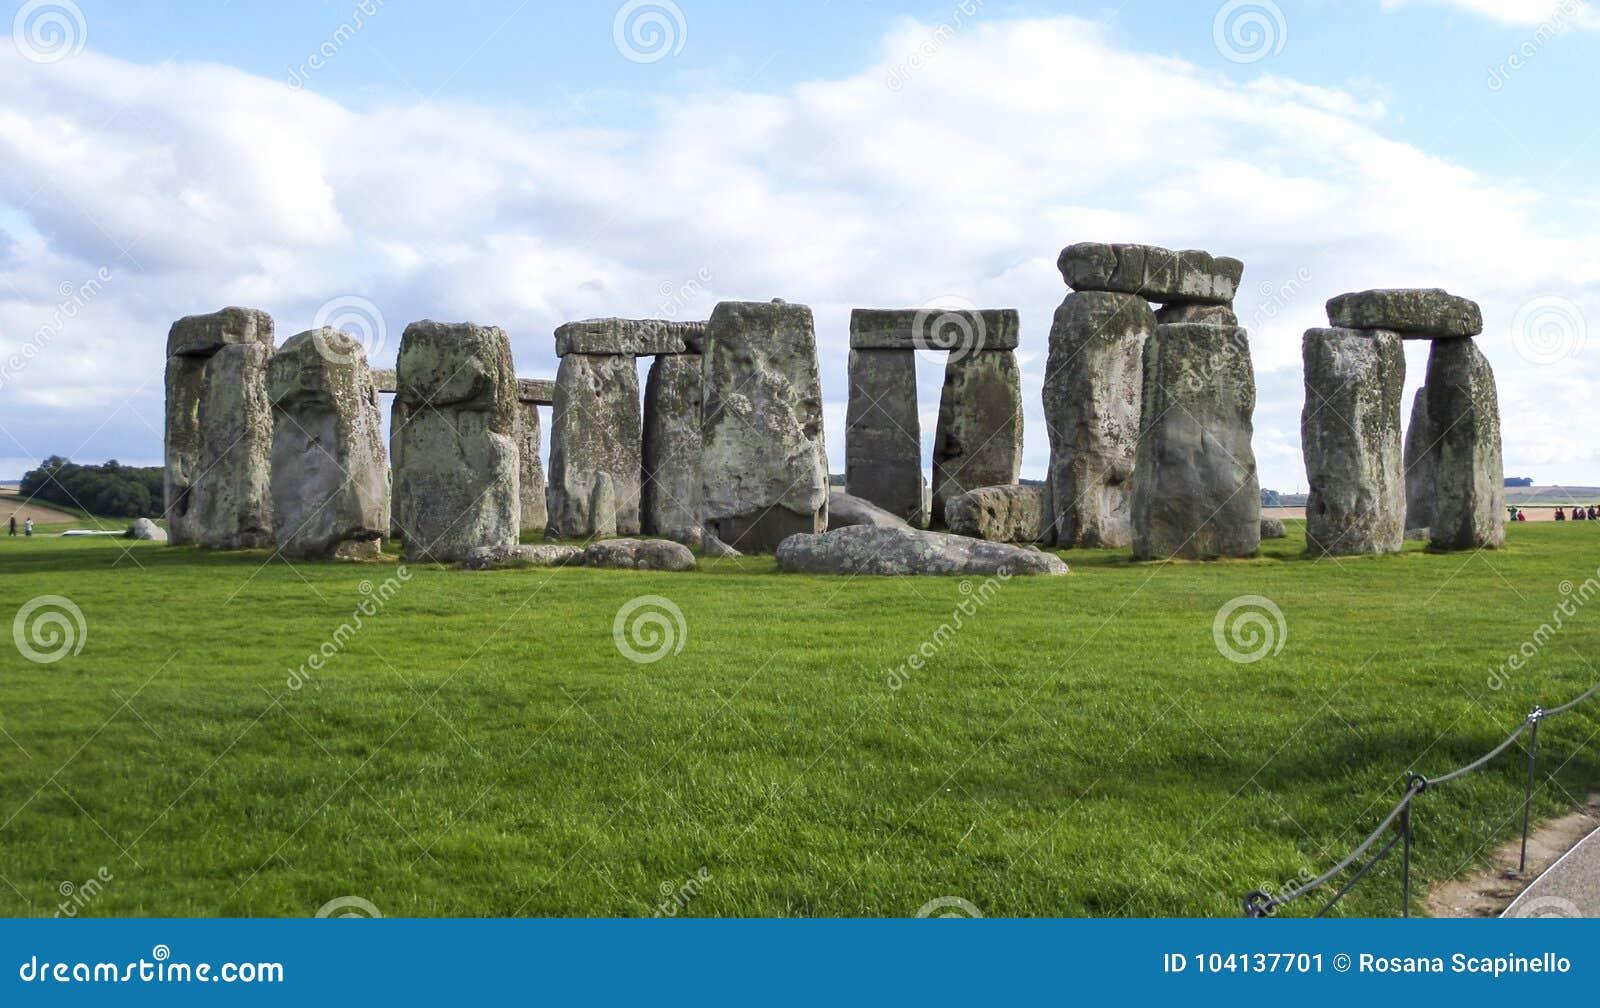 Stonehenge voorhistorisch monument in Wiltshire, Salisbury, Engeland